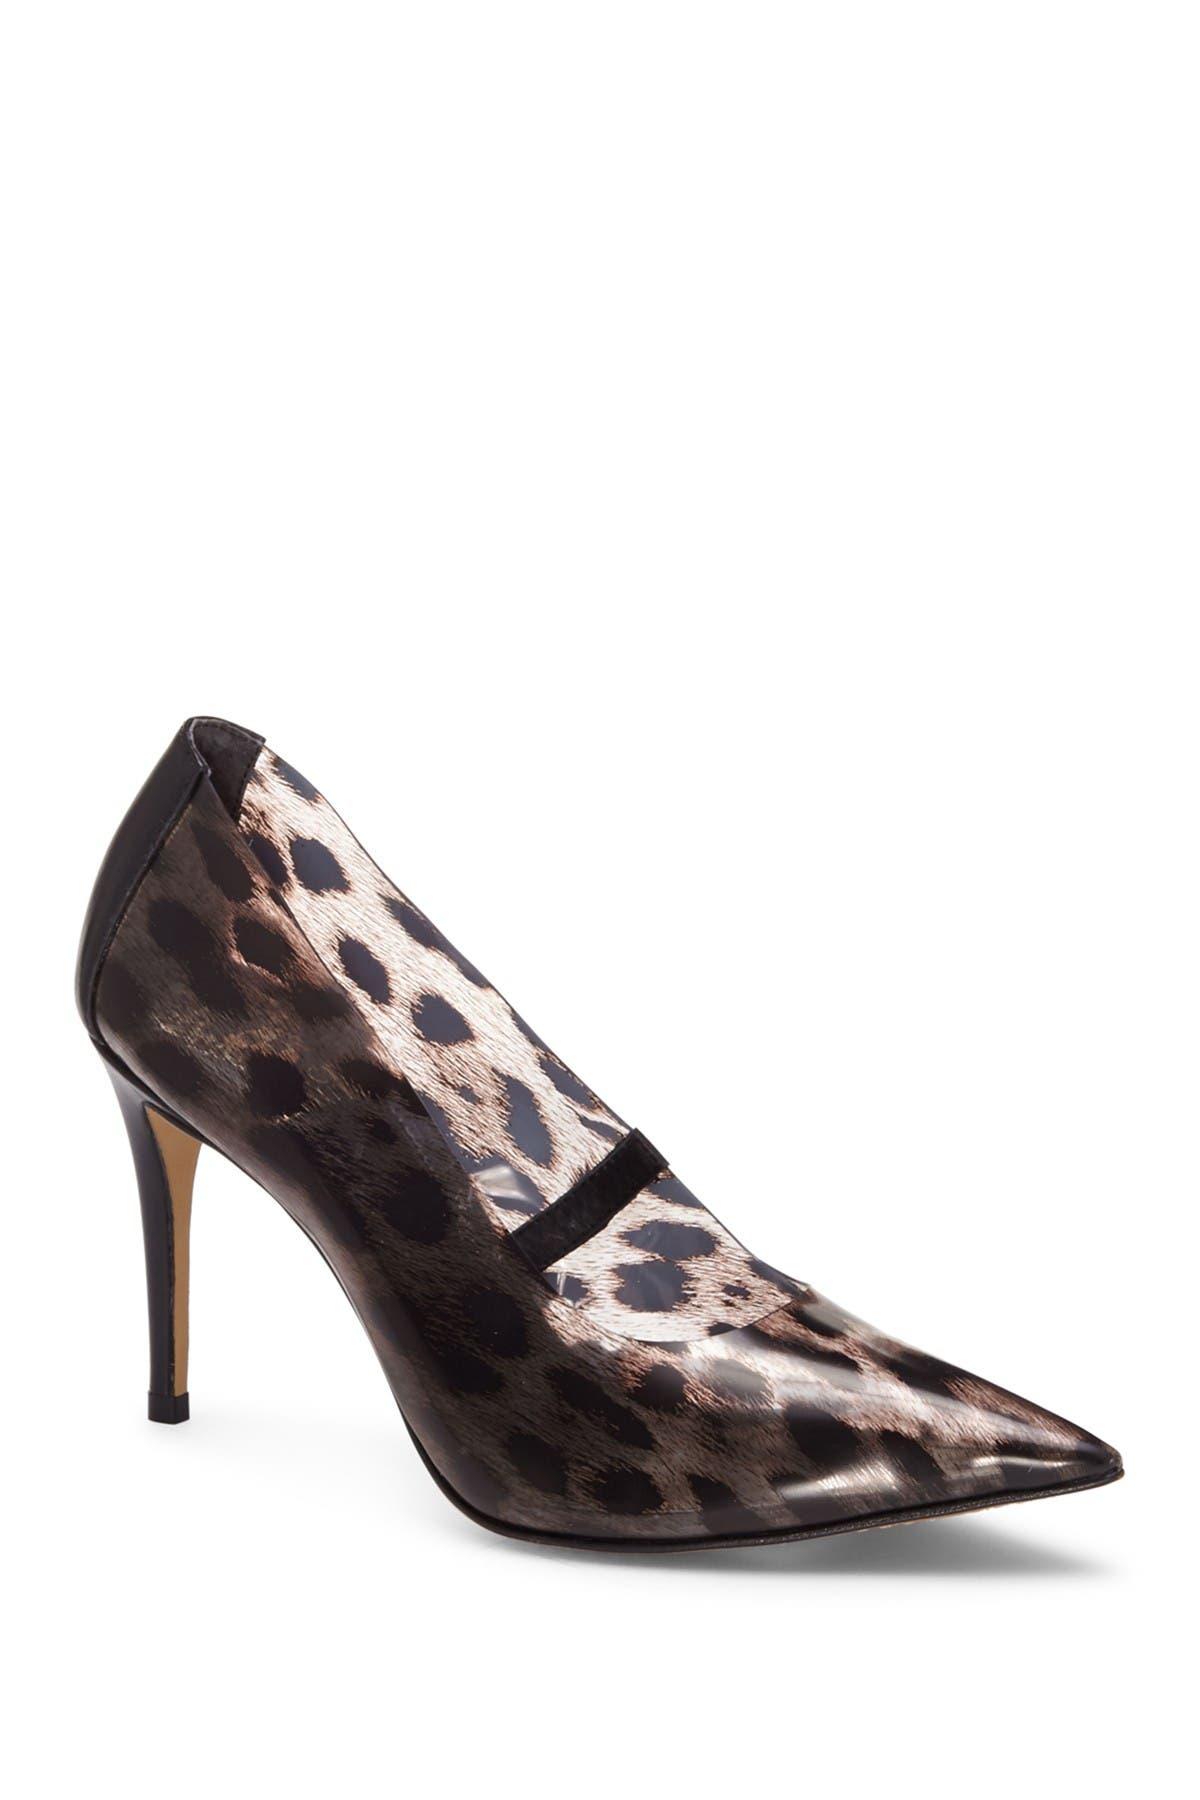 vince camuto animal print shoes